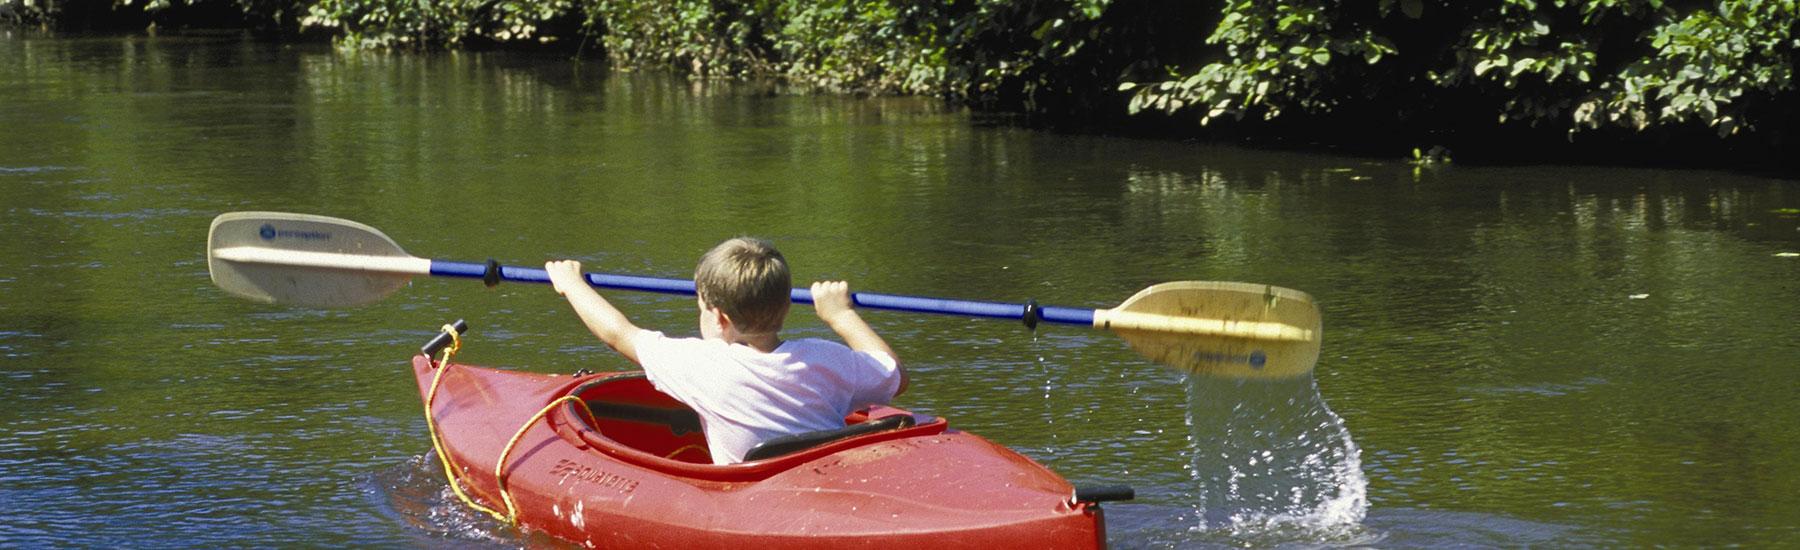 boy-canoeing-piedmont